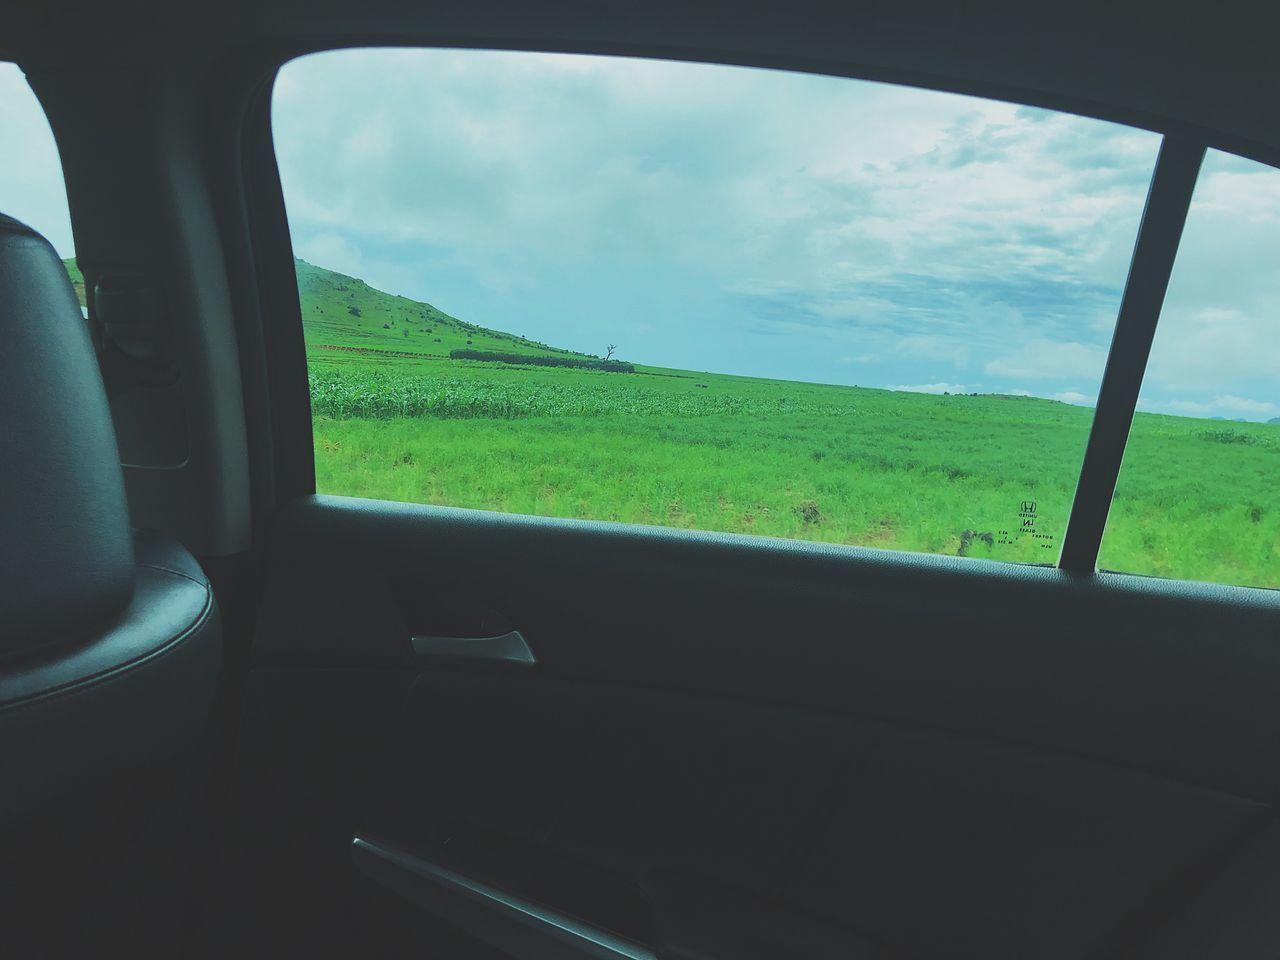 SCENIC VIEW OF FIELD SEEN THROUGH WINDOW